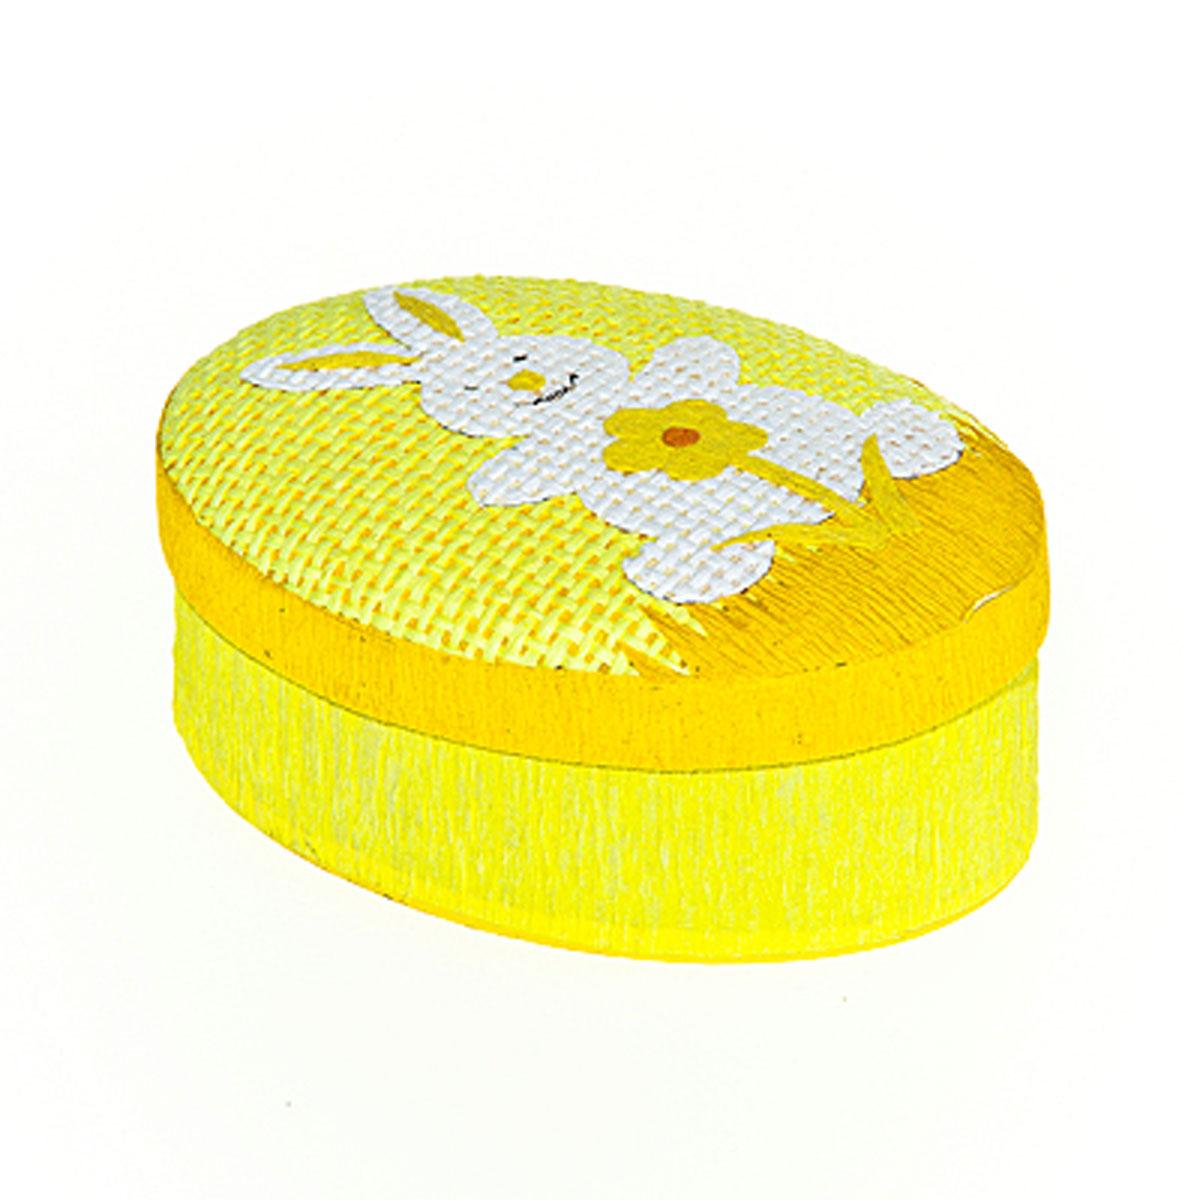 Шкатулка декоративная Home Queen Кролик с цветочком, цвет: желтый, 10,5 см х 8 см х 4 см корзина декоративная home queen ромашки цвет желтый 16 х 16 х 8 см